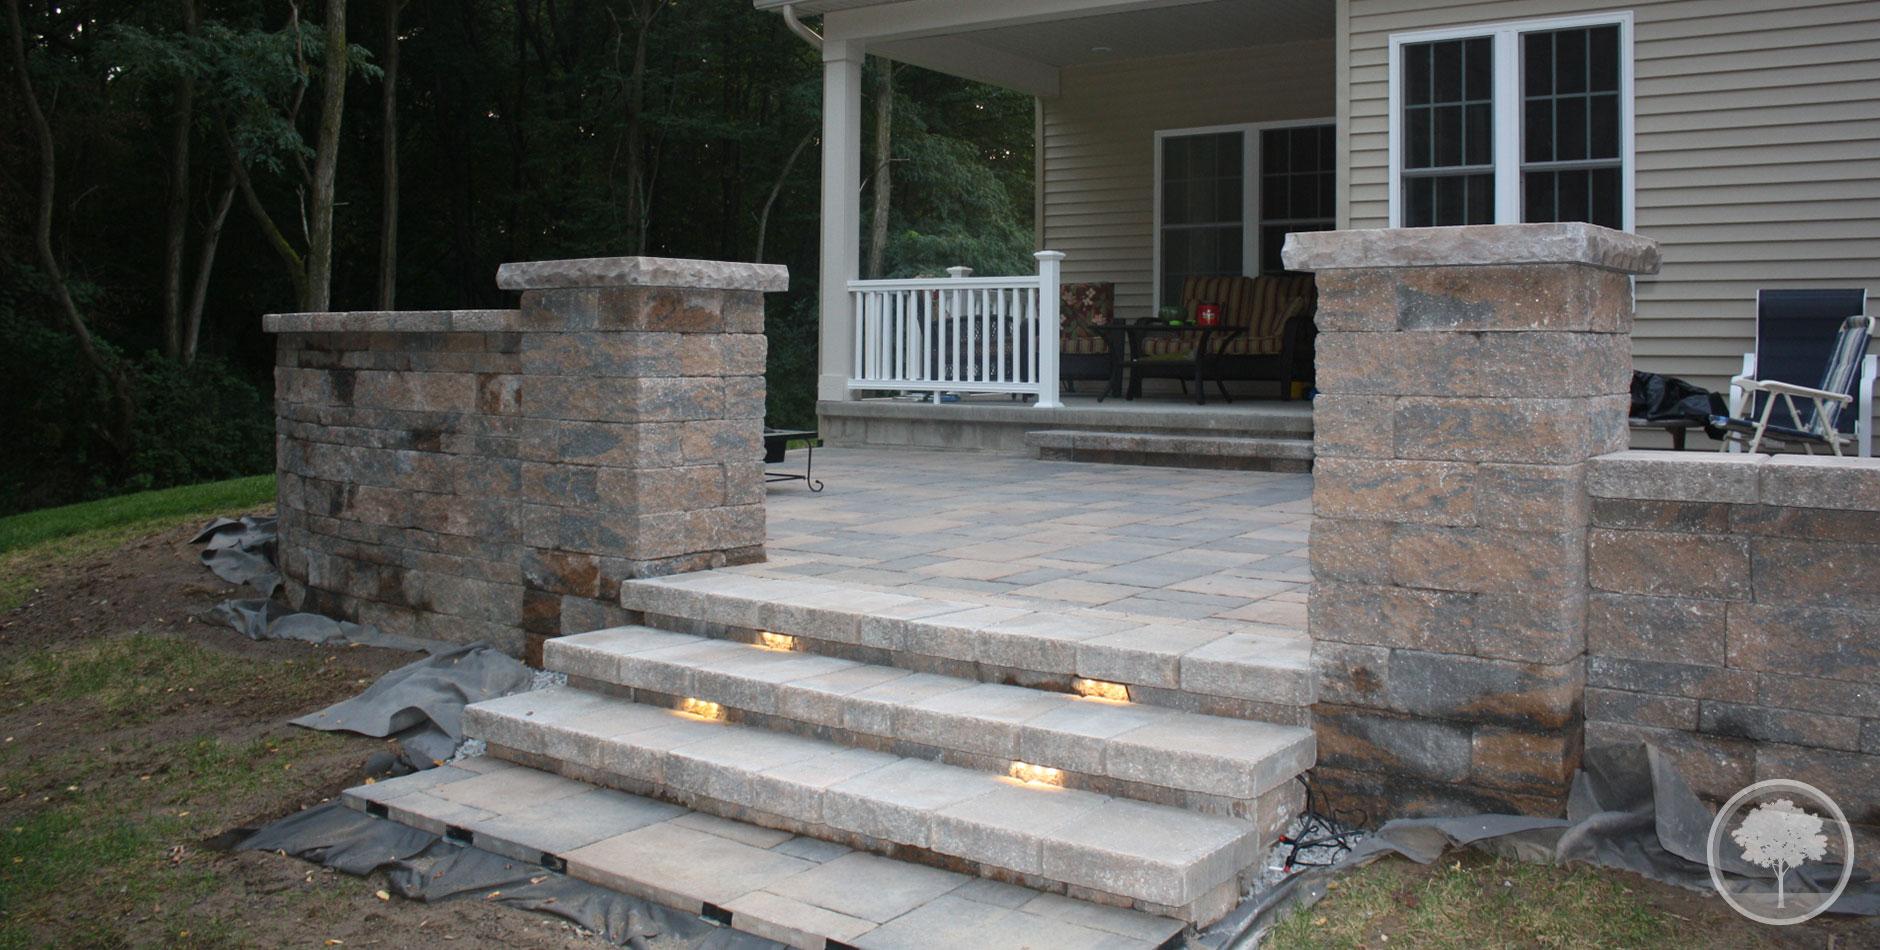 LaShomb Lawn & Landscape Patio - Steps - Lighting - Walls ... on Backyard Stairs Ideas id=19008